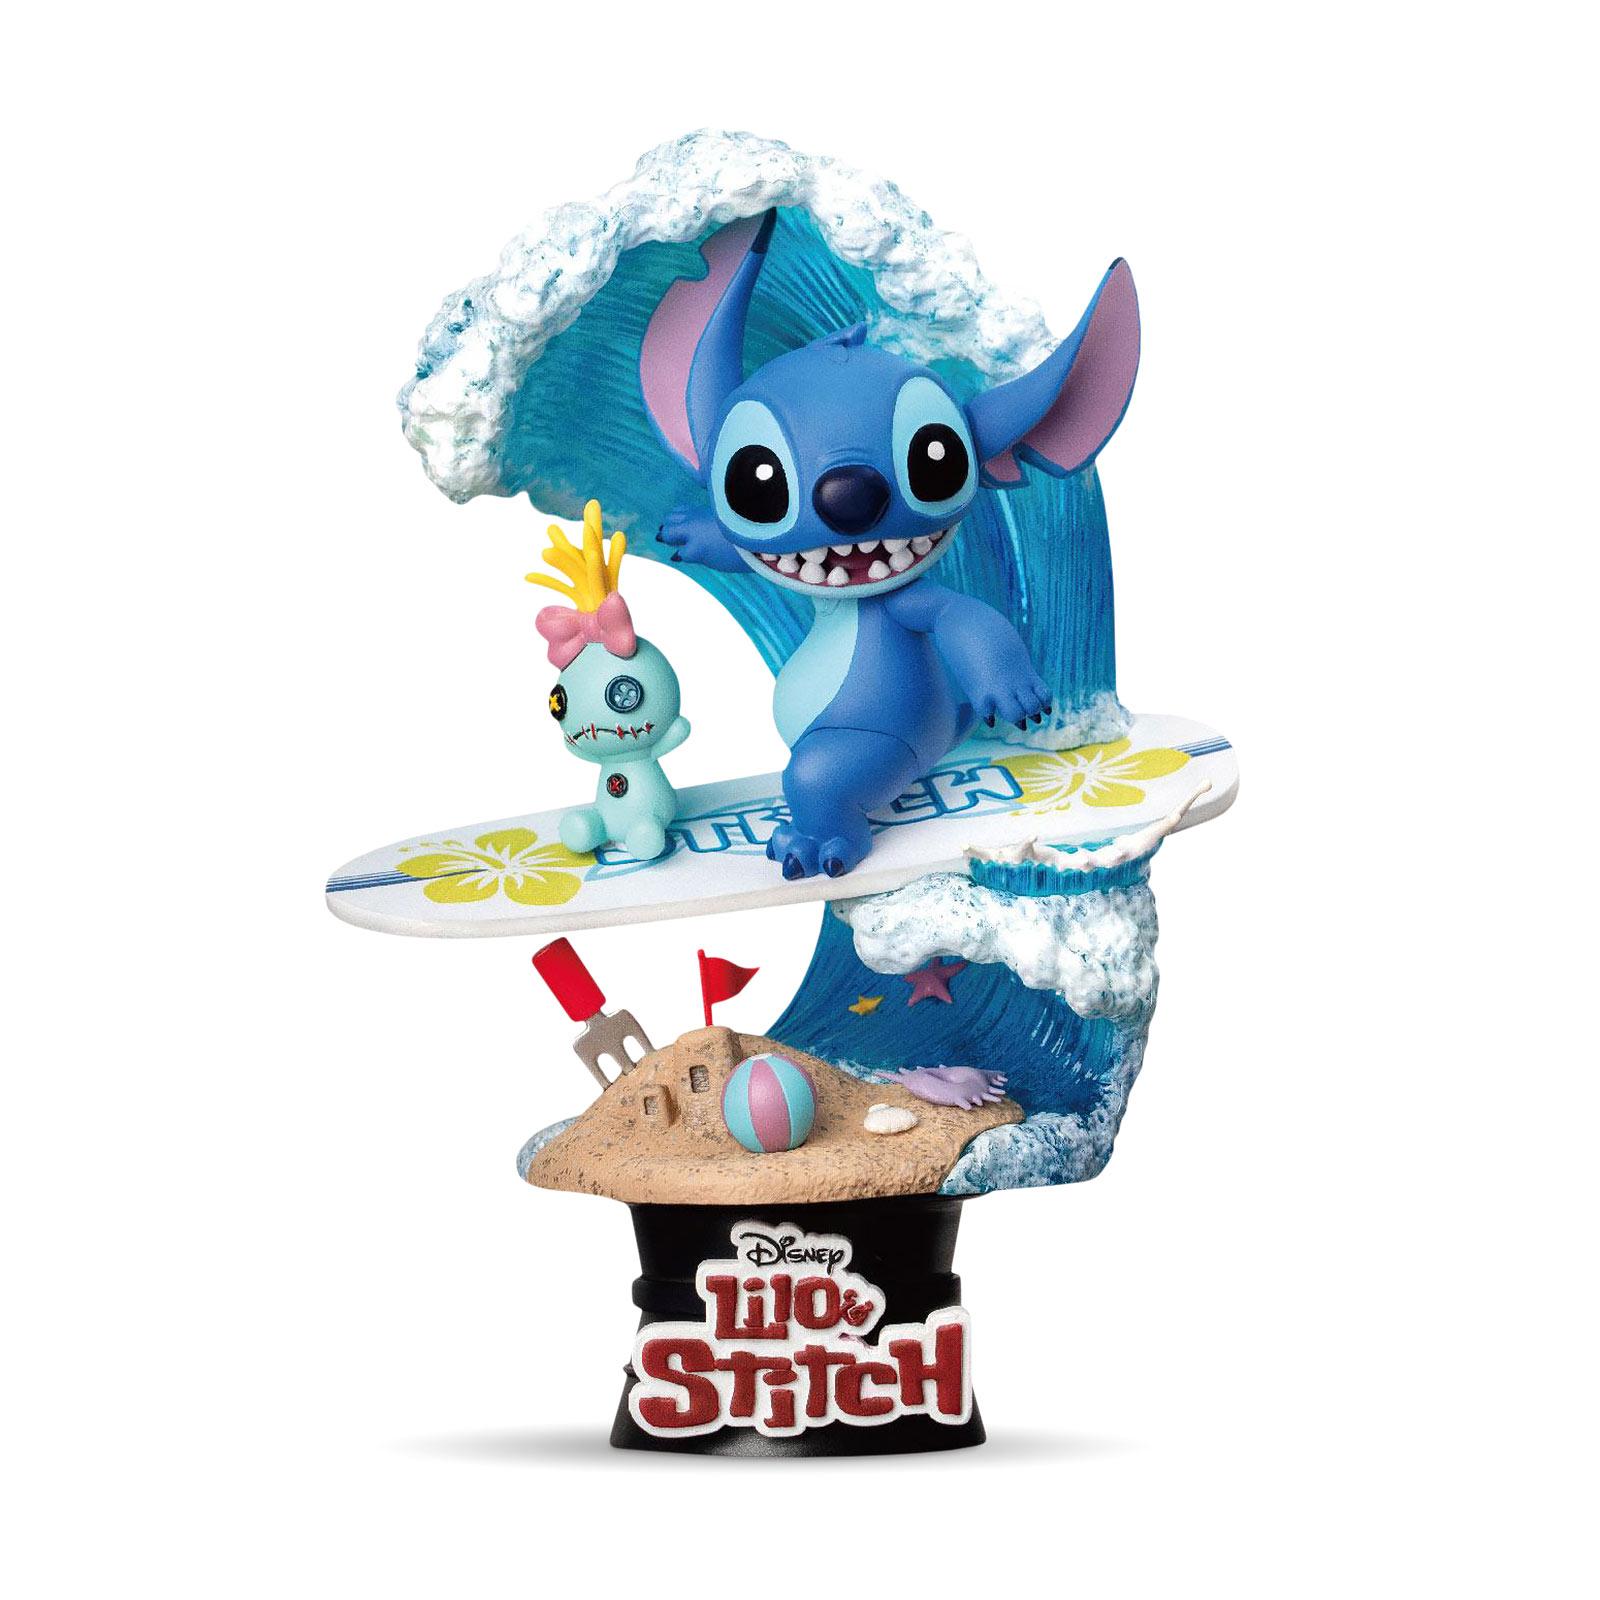 Lilo & Stitch - Surfer Stitch Diorama 15 cm